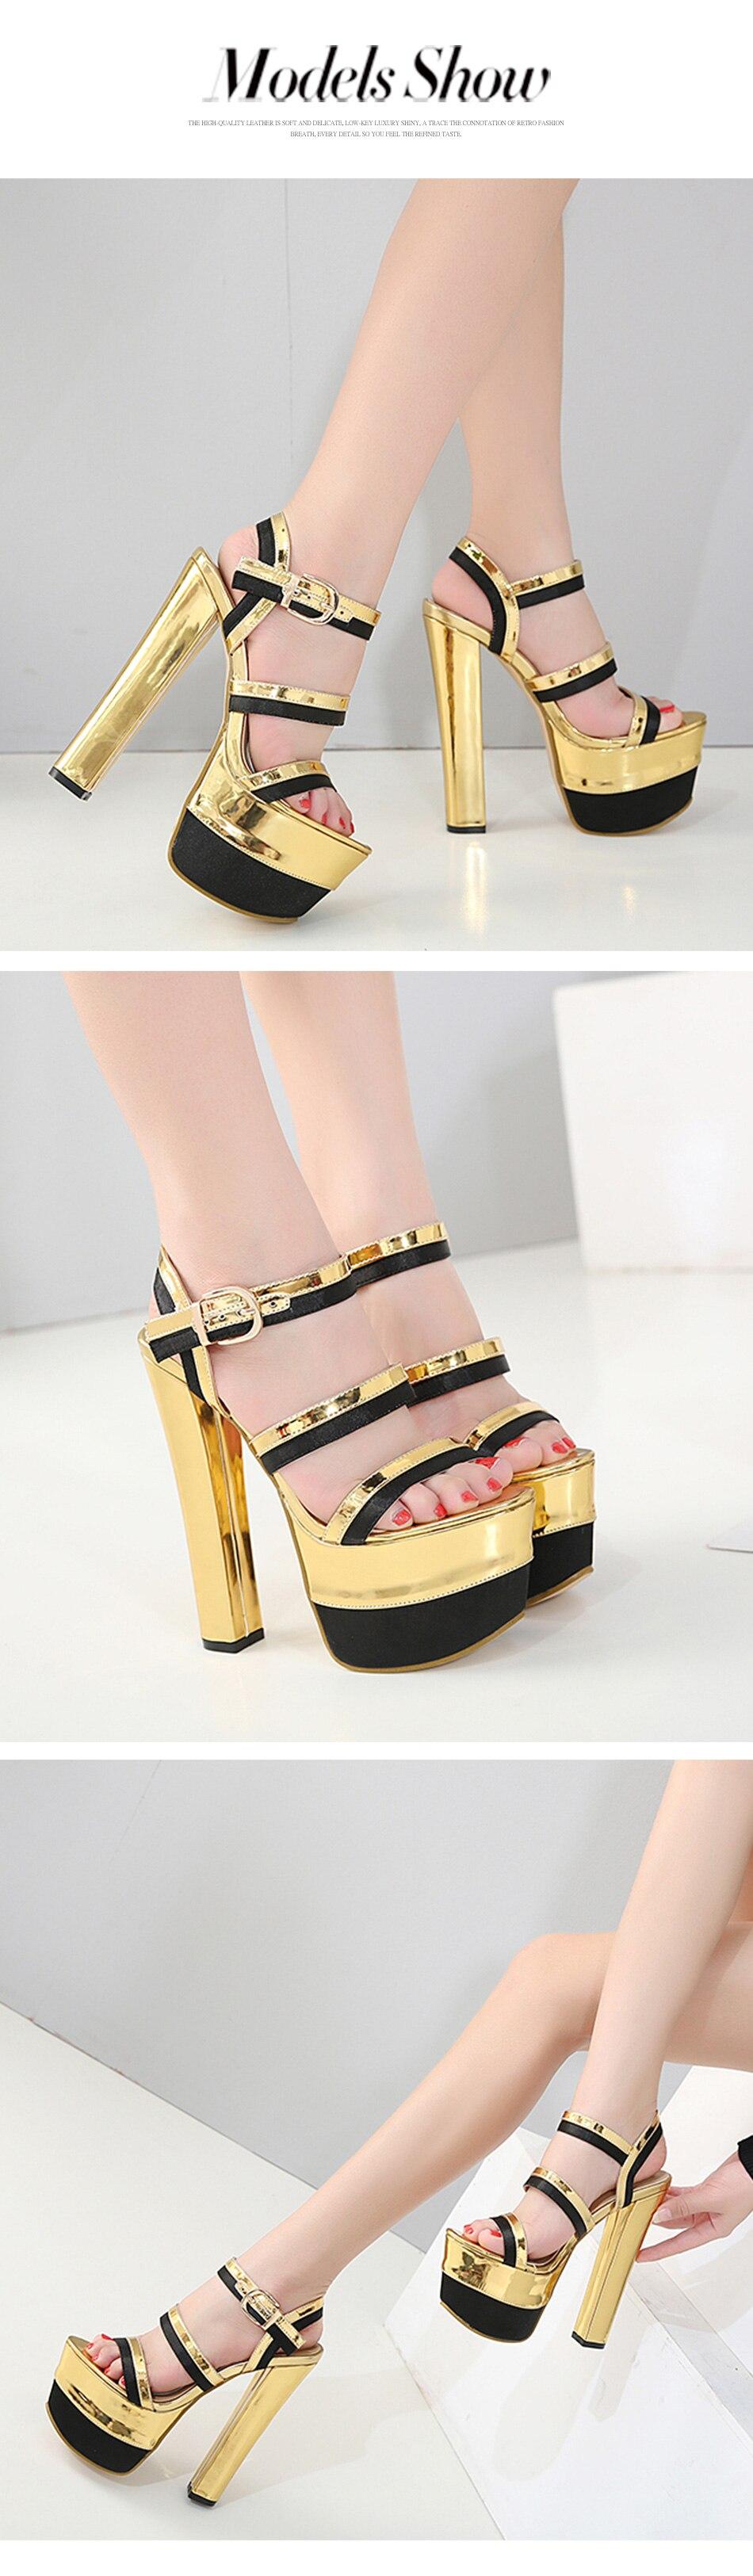 Women Summer Shoes summer wedges sandals sandalias de salto